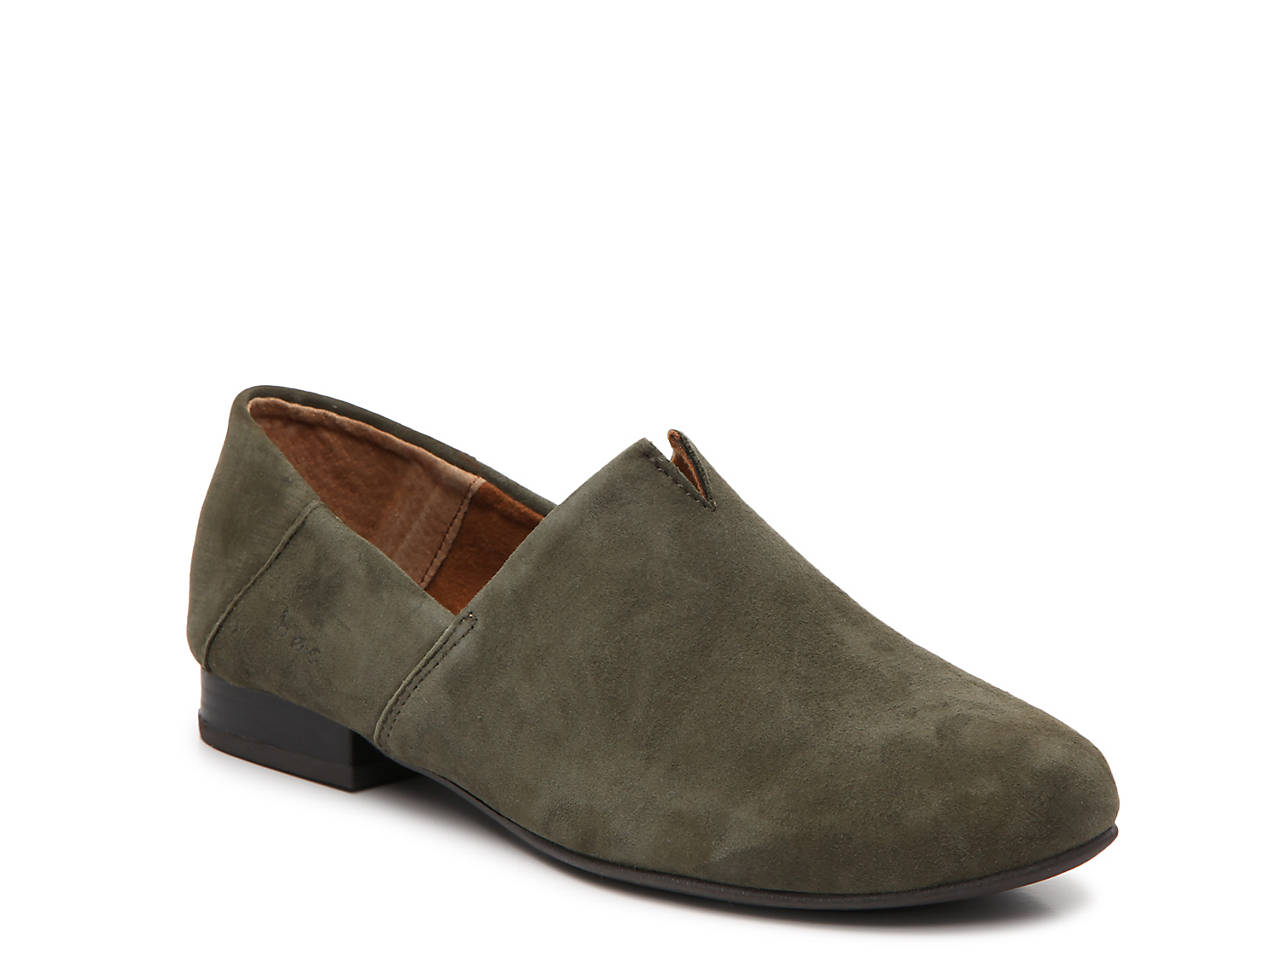 a731a992ea79c b.o.c Suree Slip-On Women's Shoes | DSW